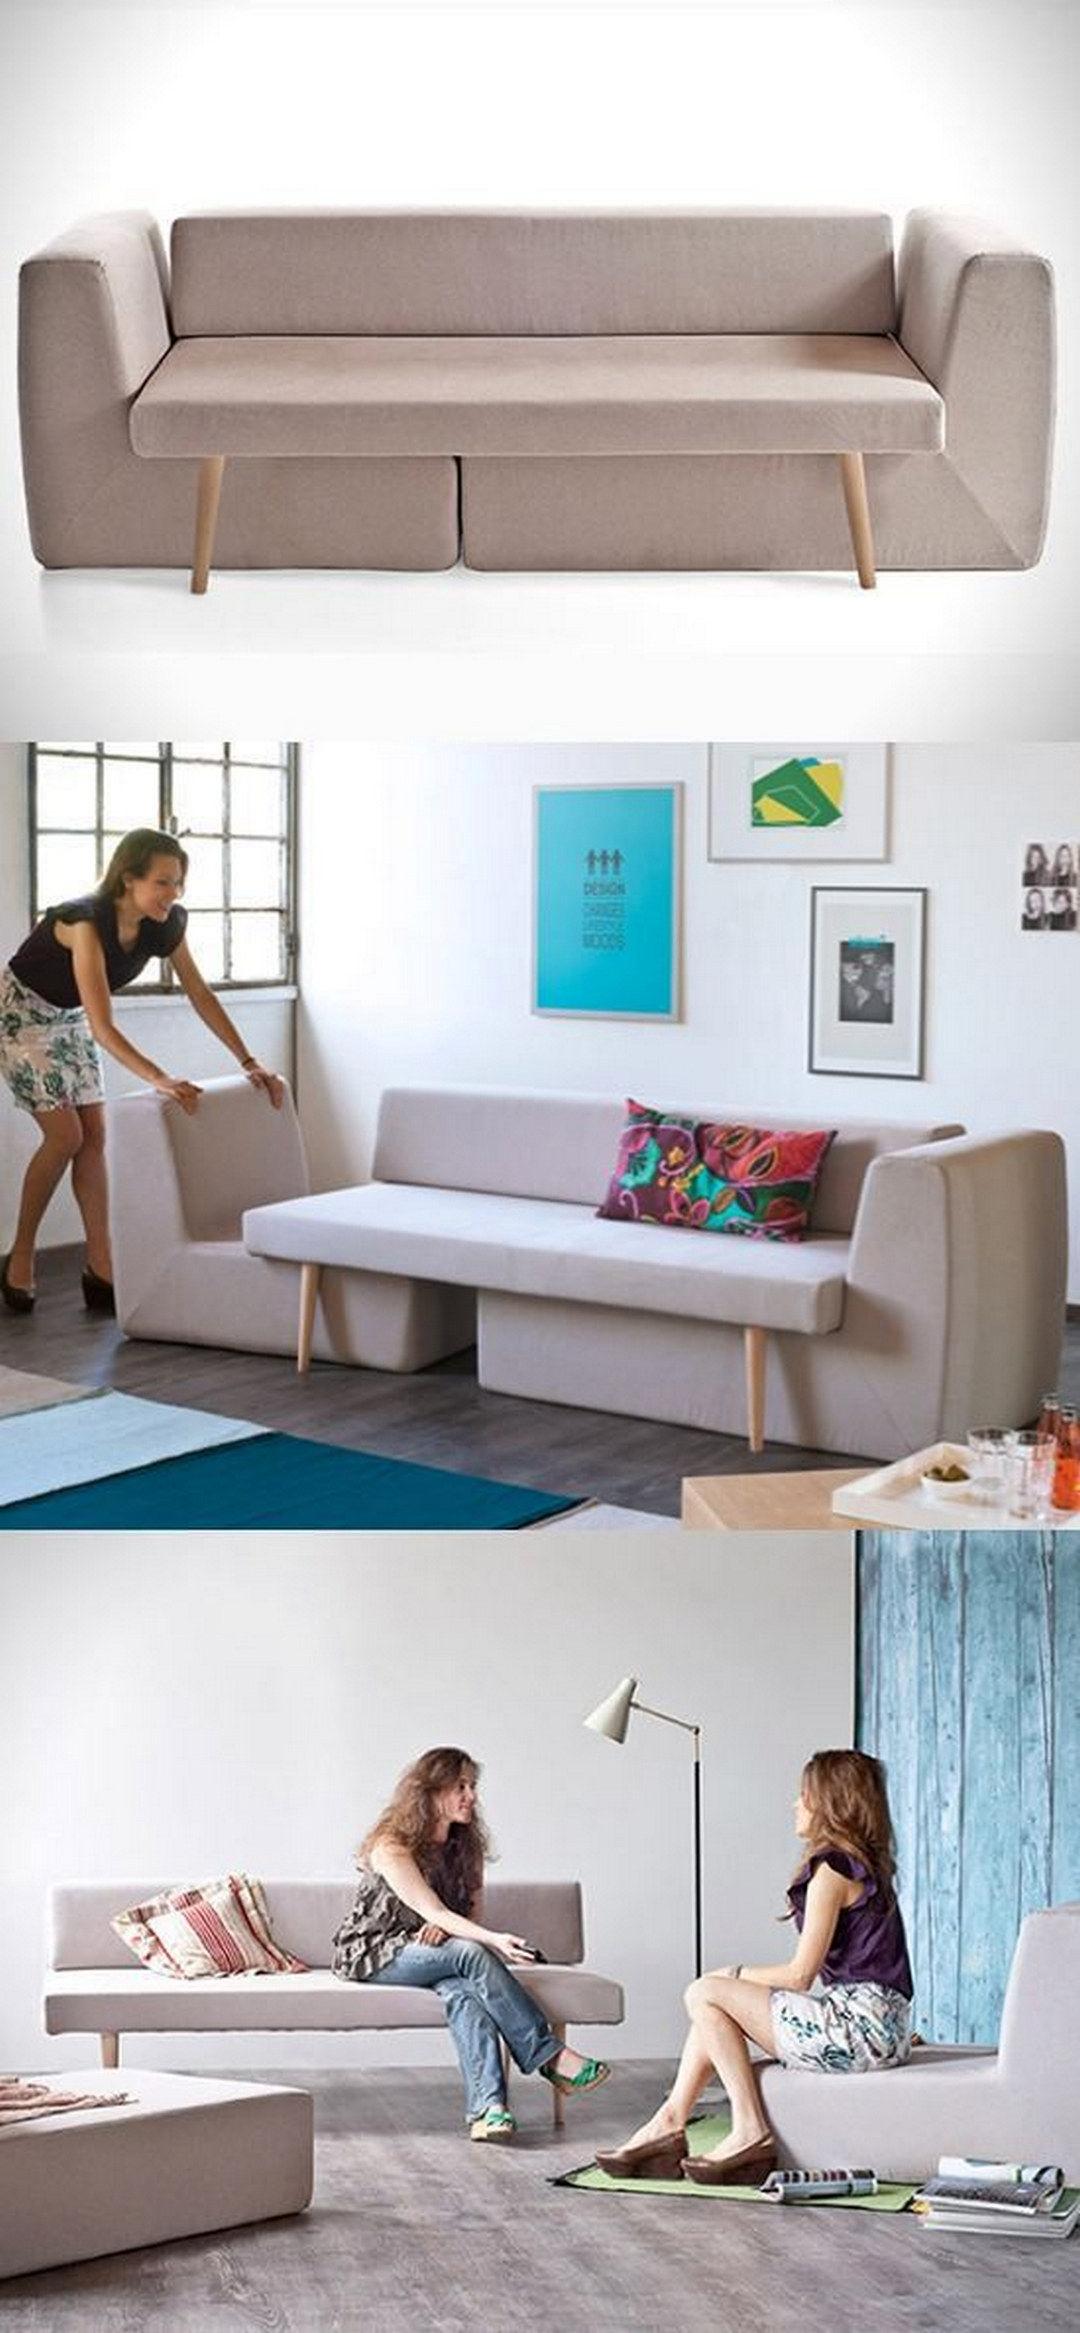 coolest modular furniture designs smart decor pinterest